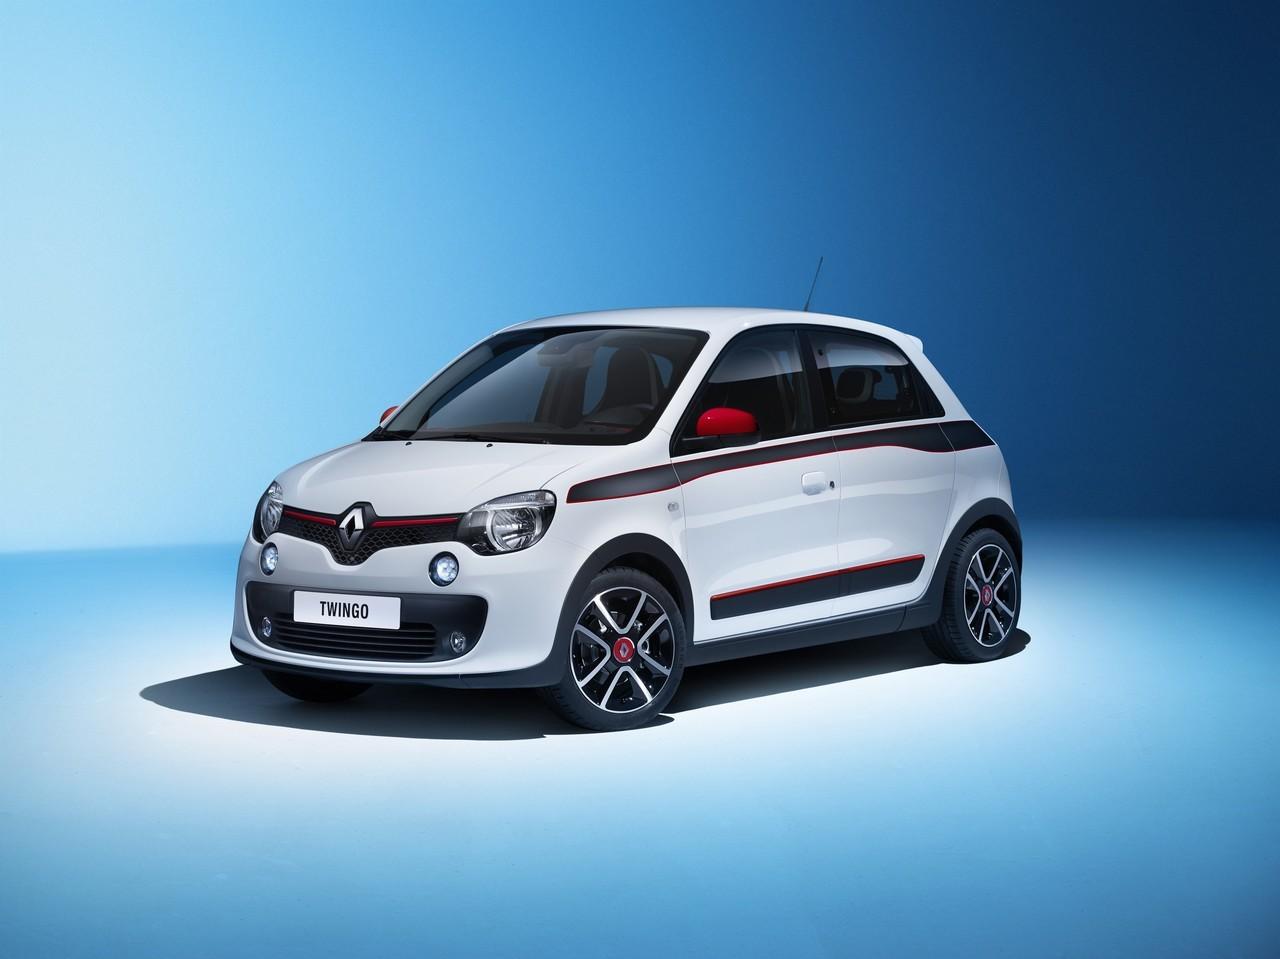 Foto de Renault Twingo 2014 (1/13)